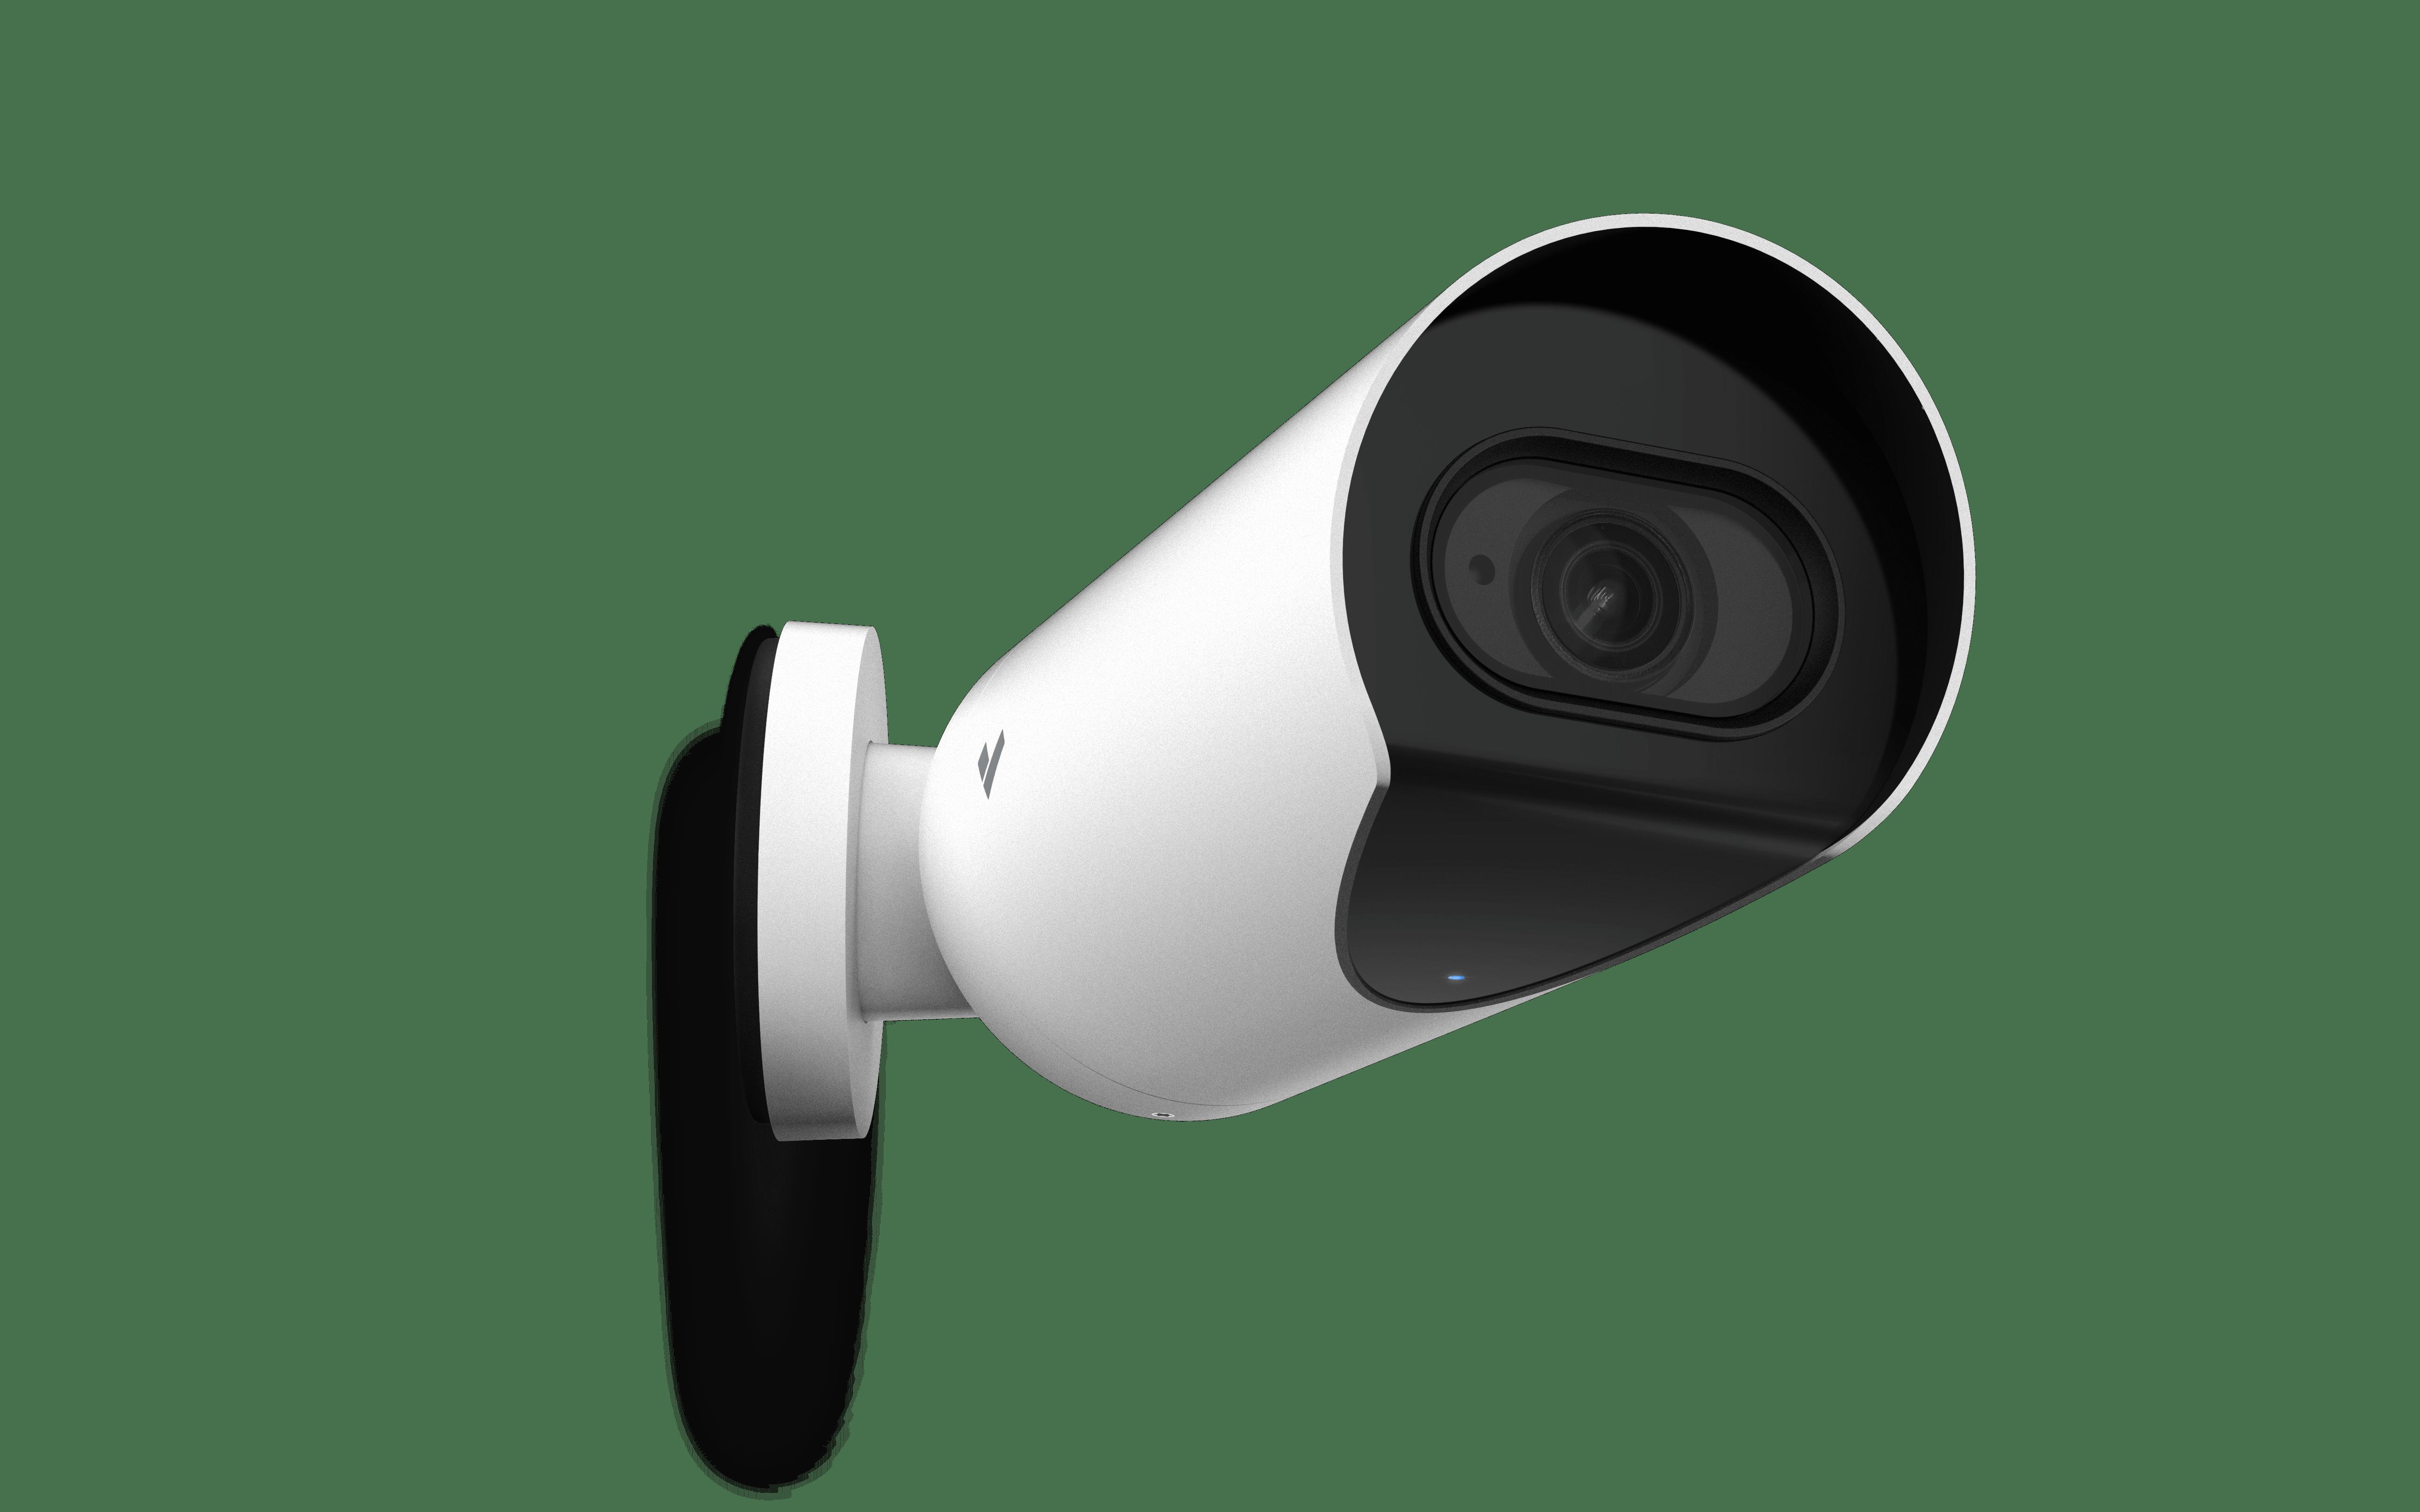 Verkada Bullet Camera Review